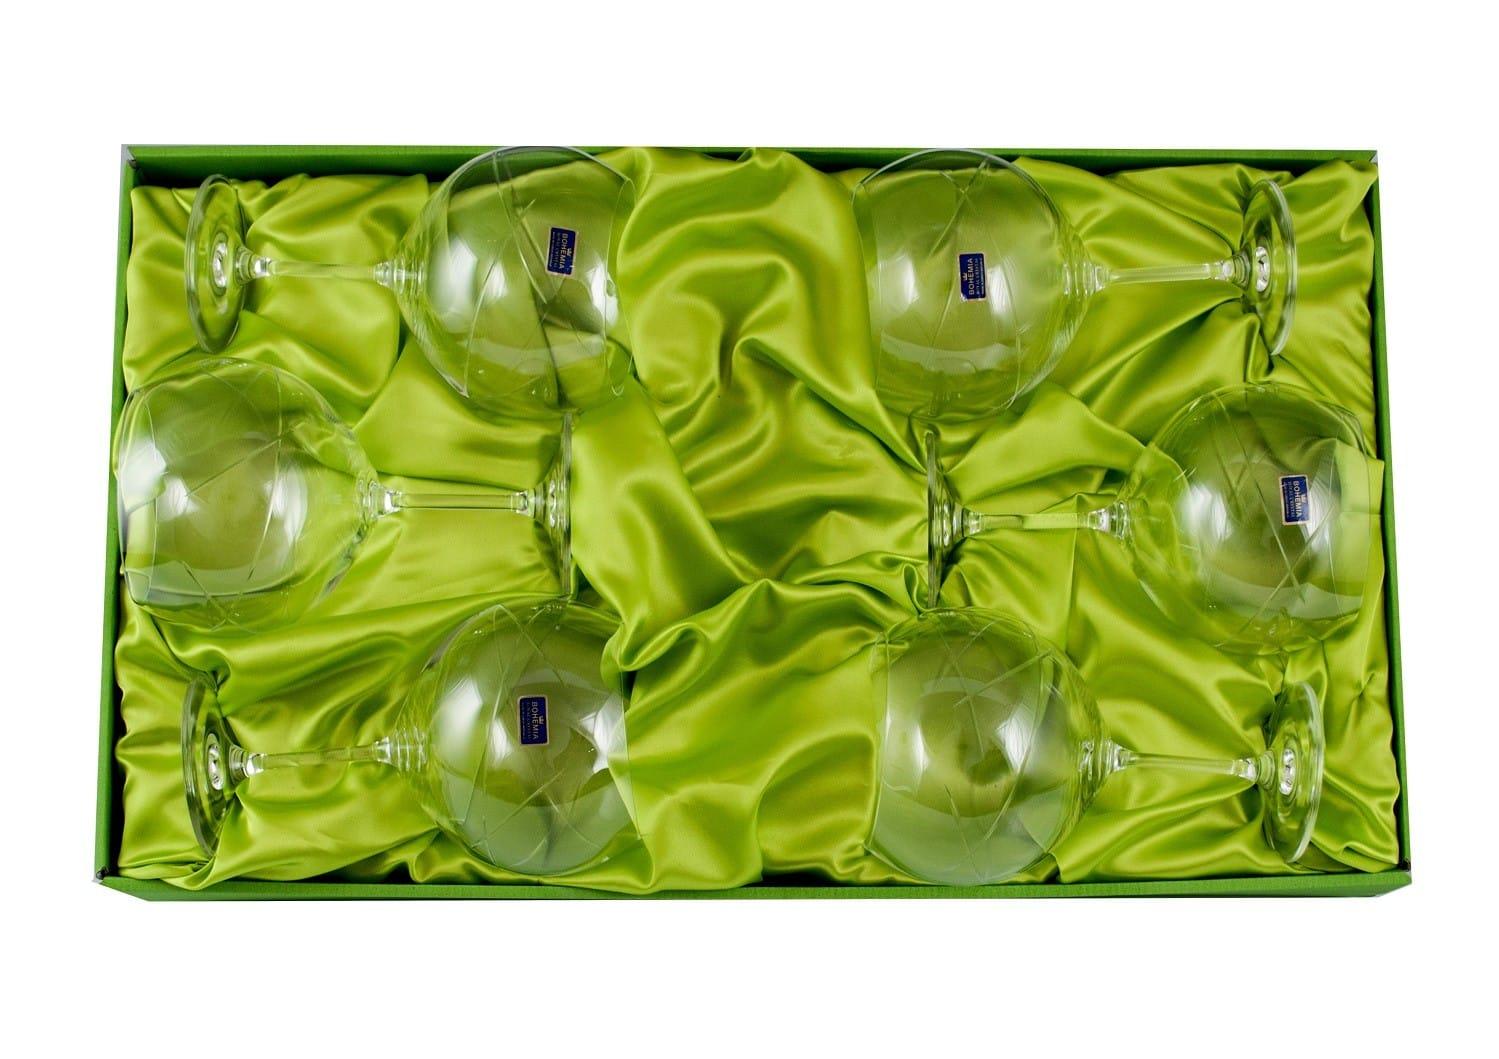 Six-glass Gin and Tonic set (E5 engraving)